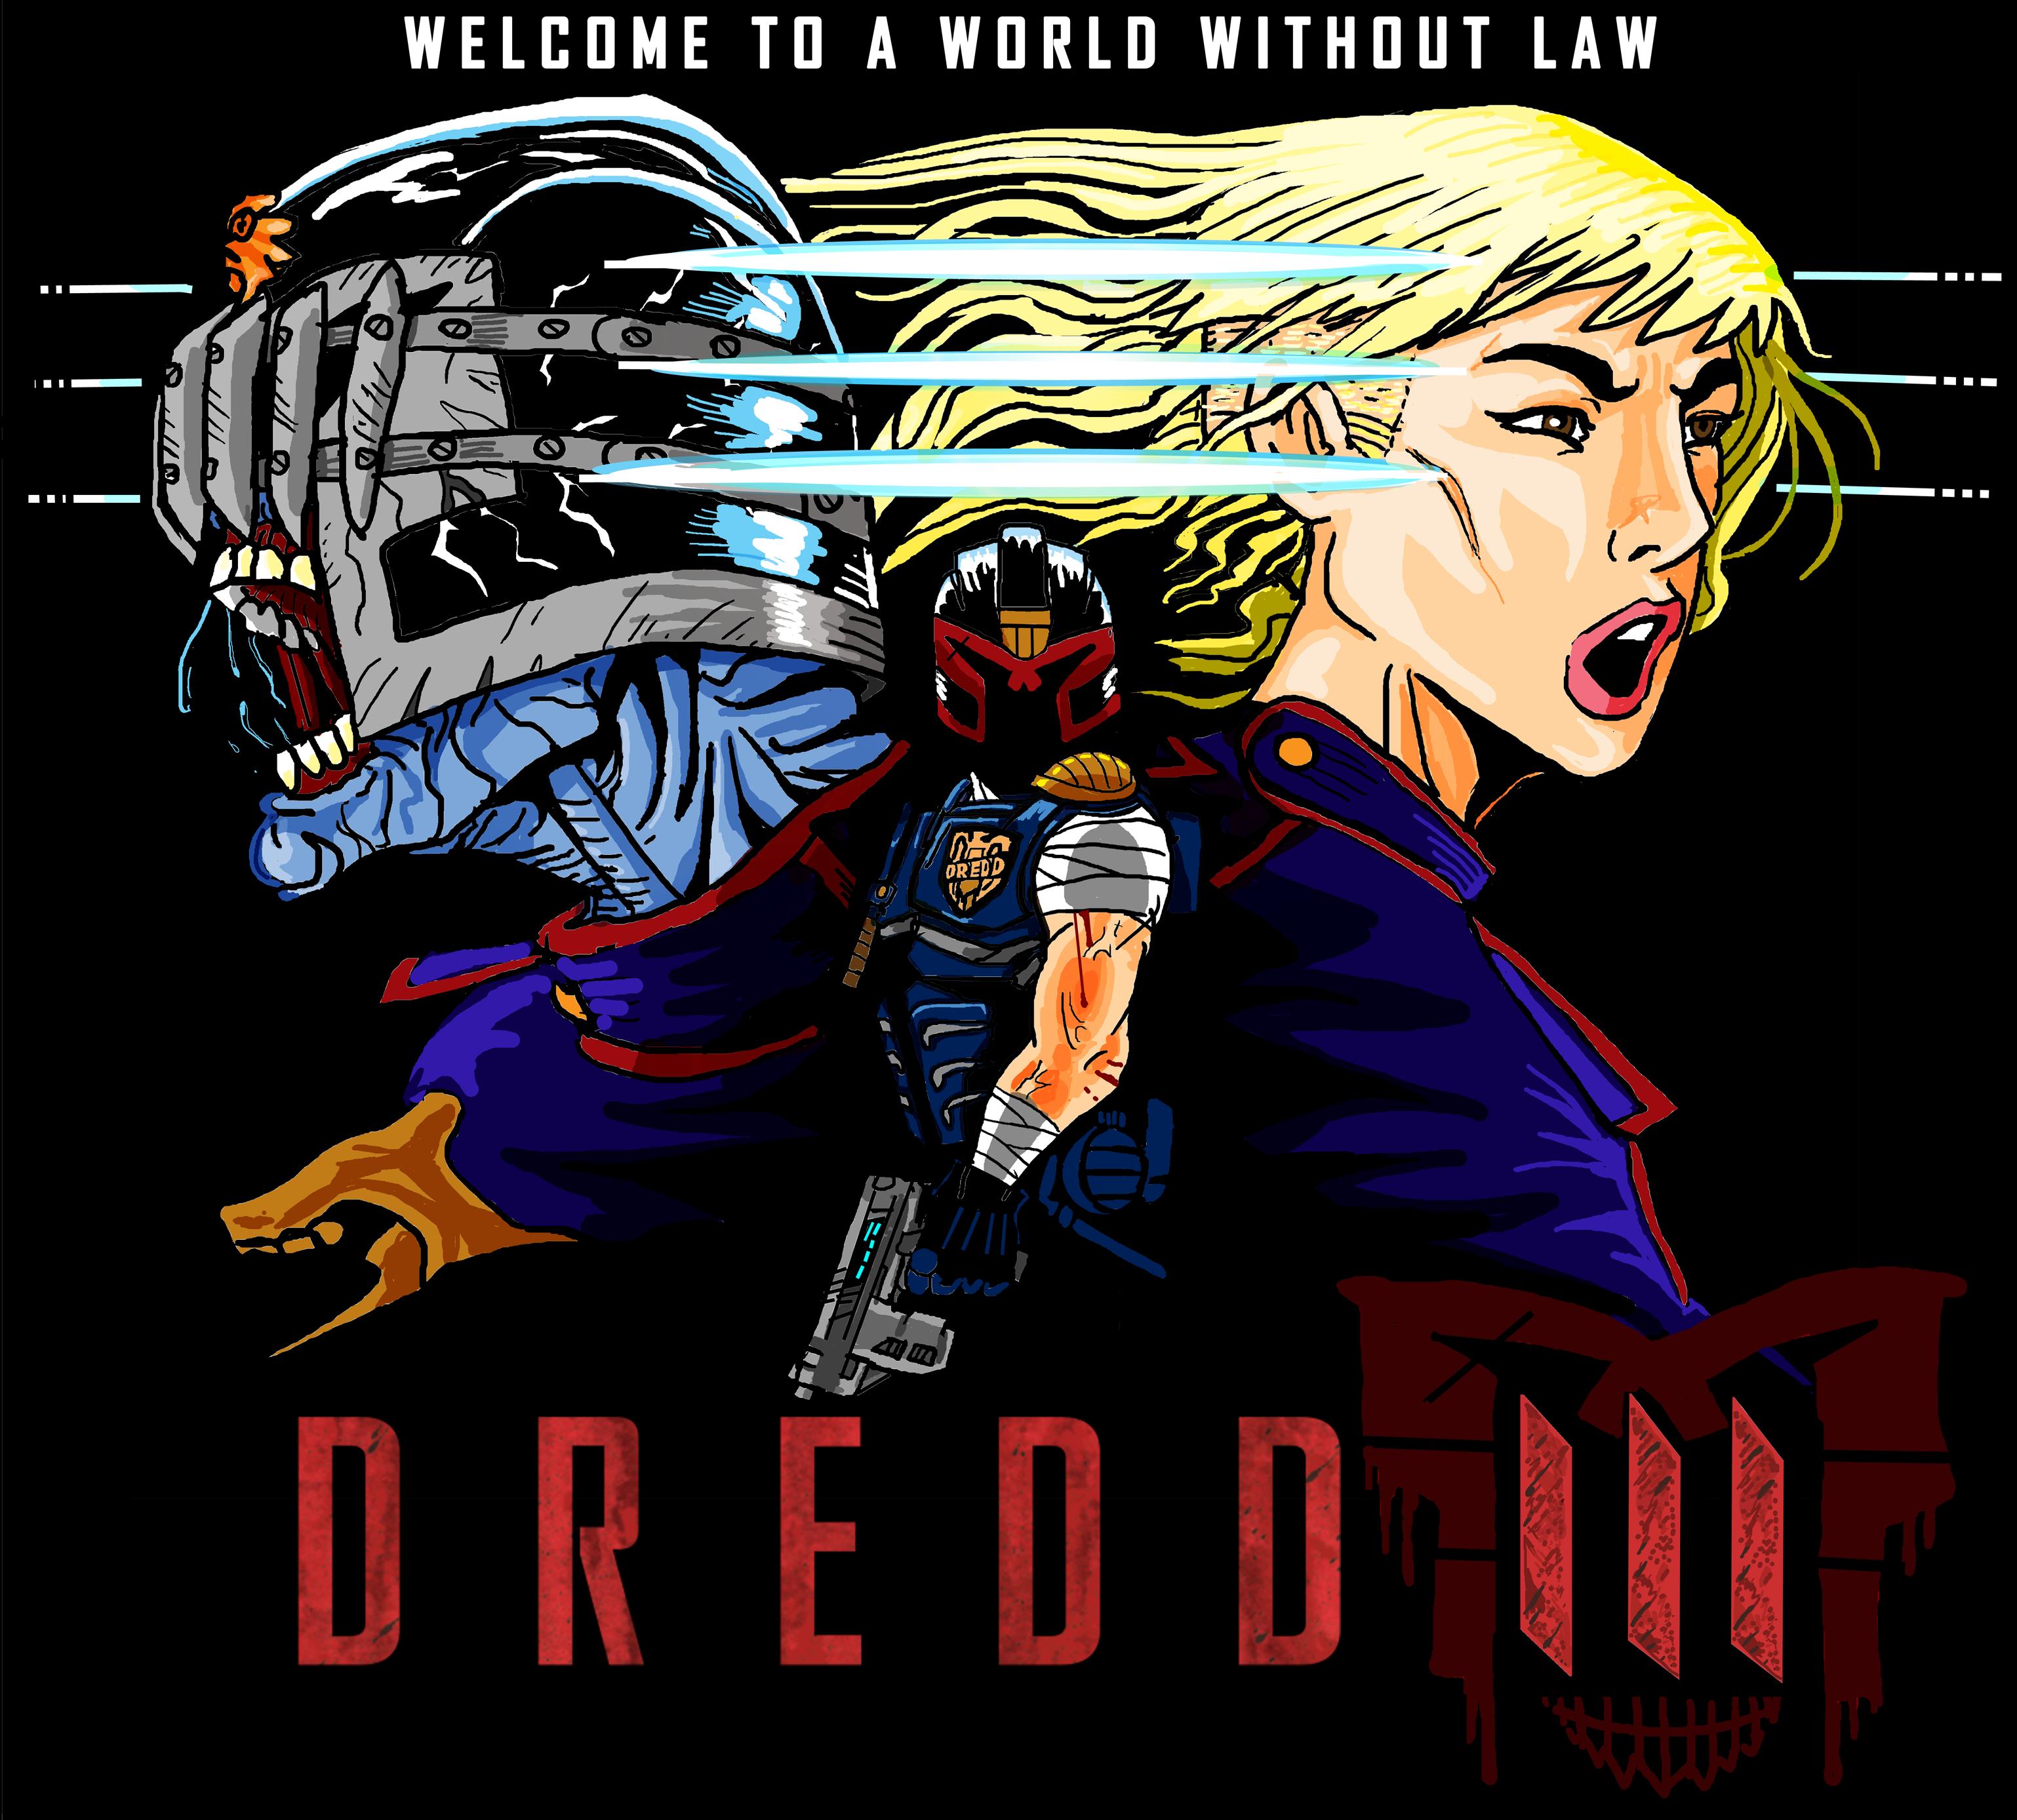 Dredd 3 Mega Fan Treatment By Jarol-Tilap On DeviantArt